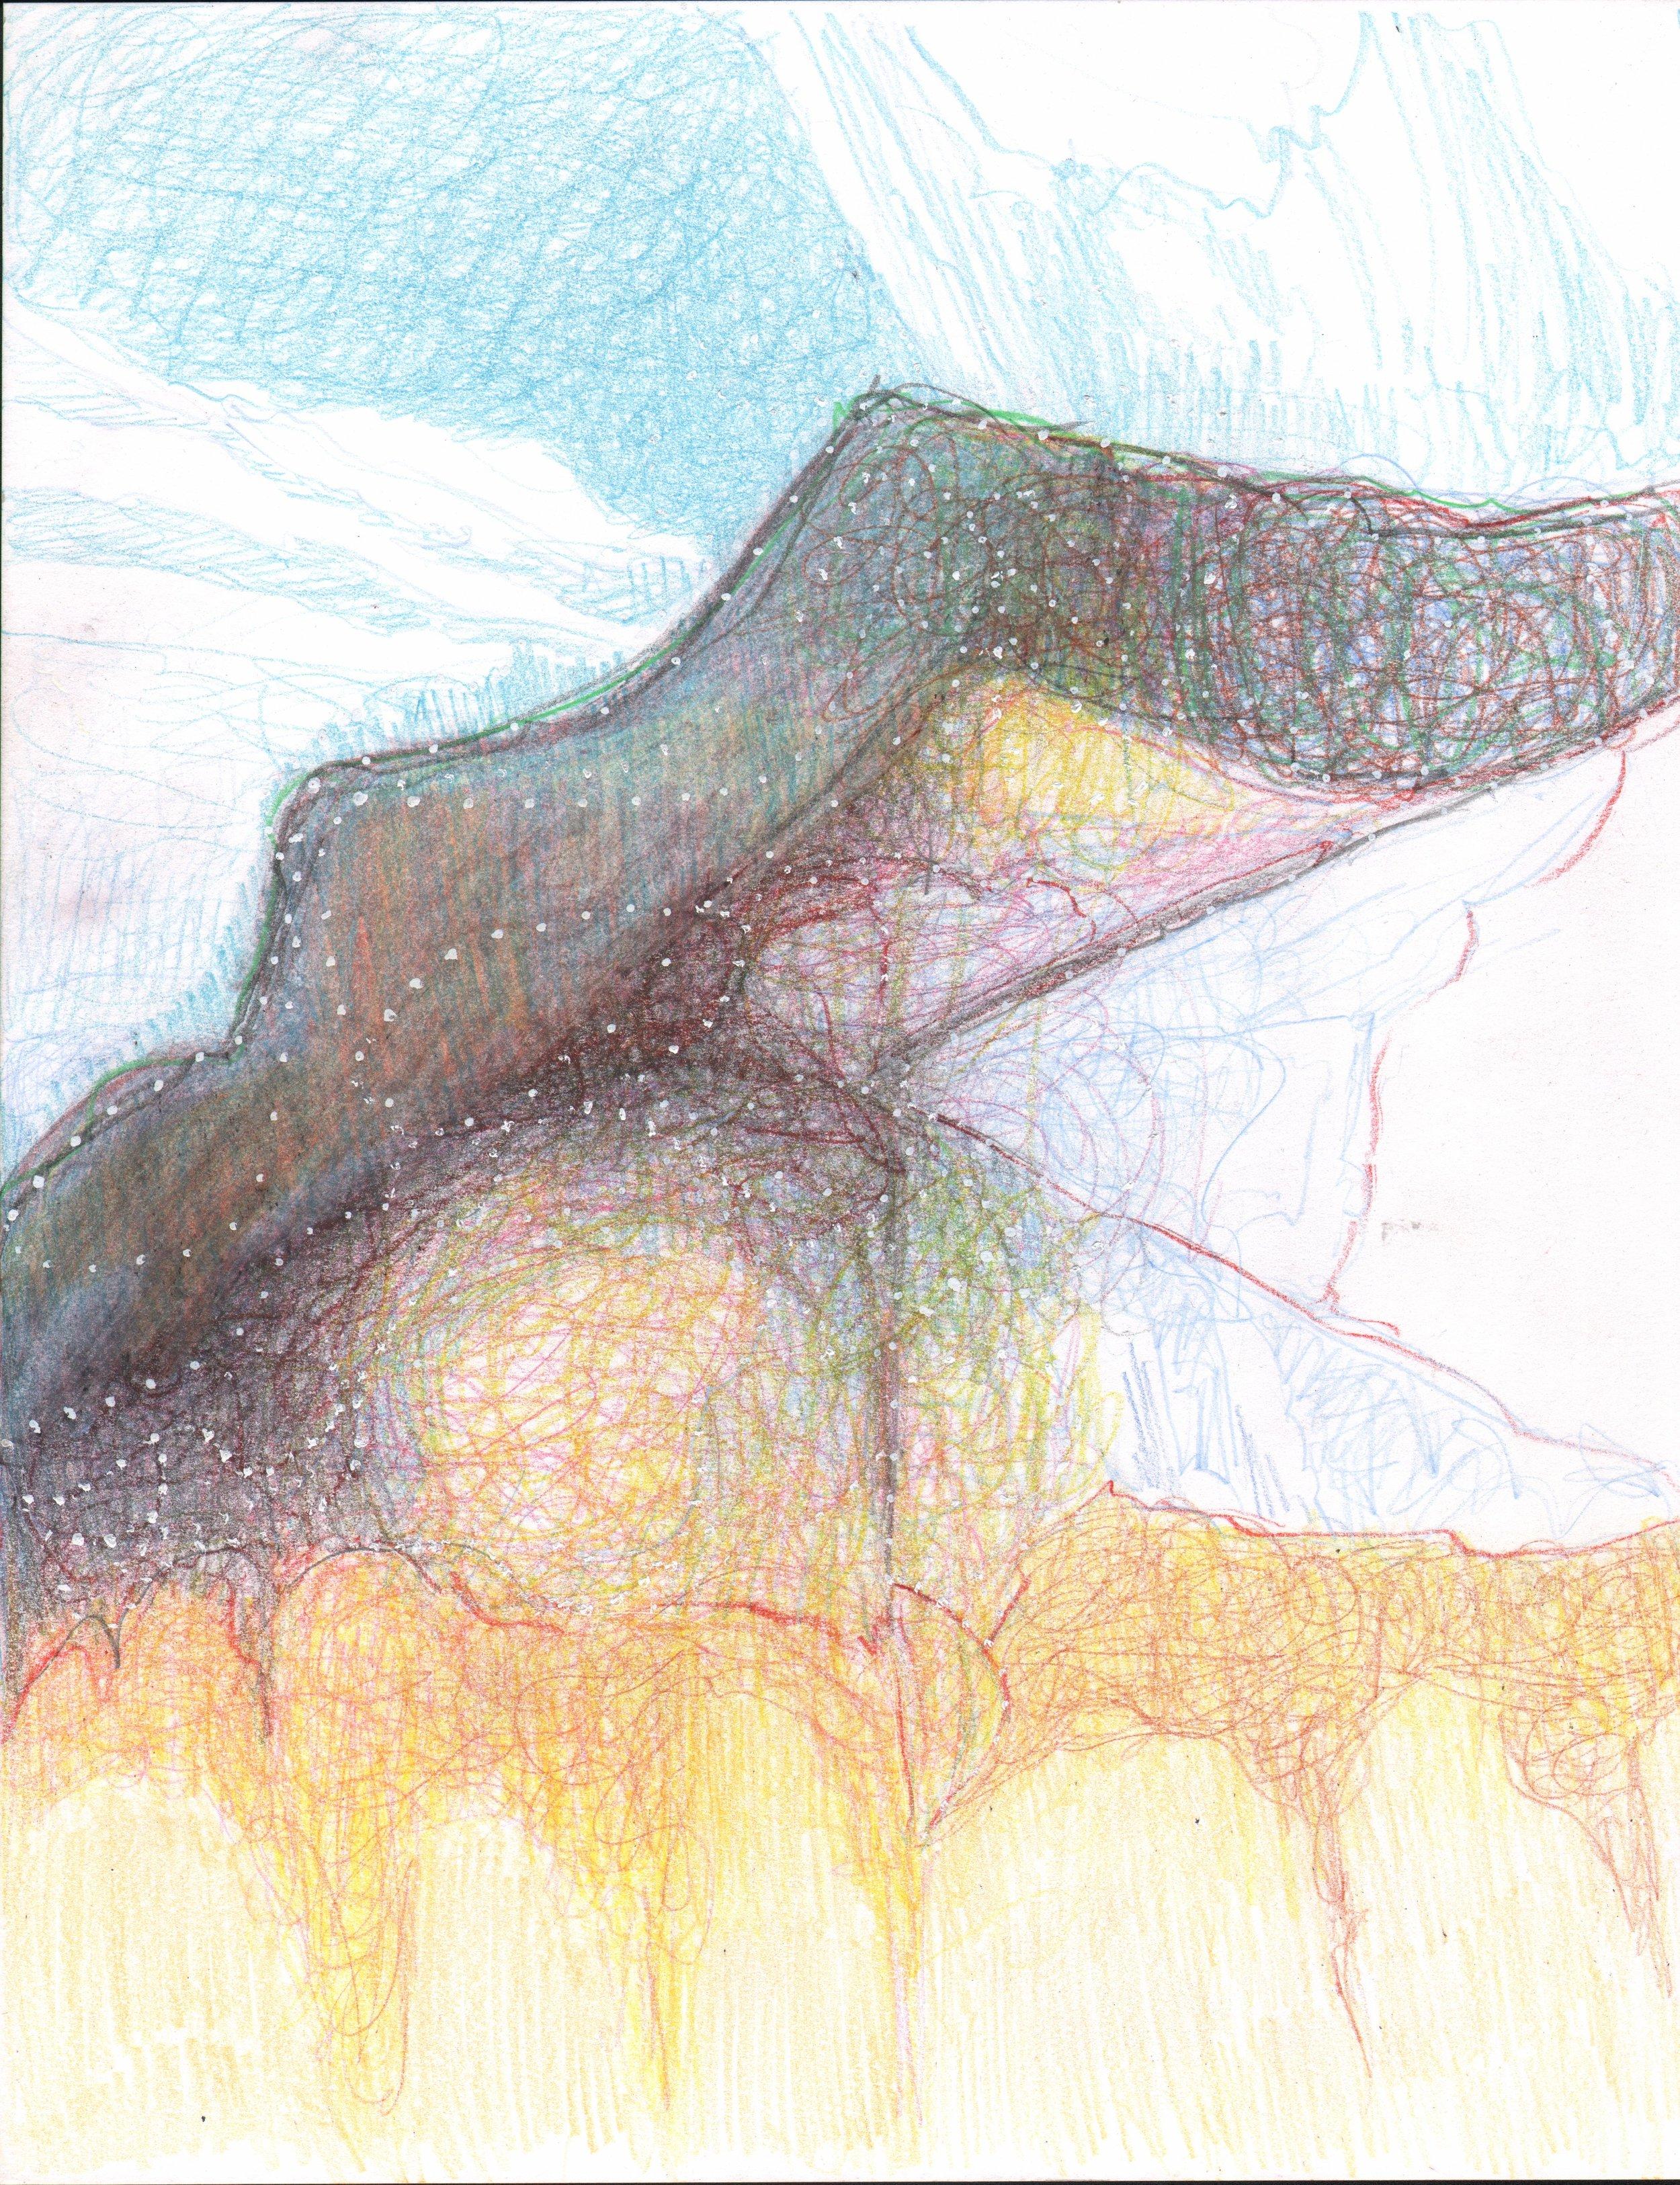 Bridge, (the twilights), 2017, 14 x 11 inches, pencil on paper